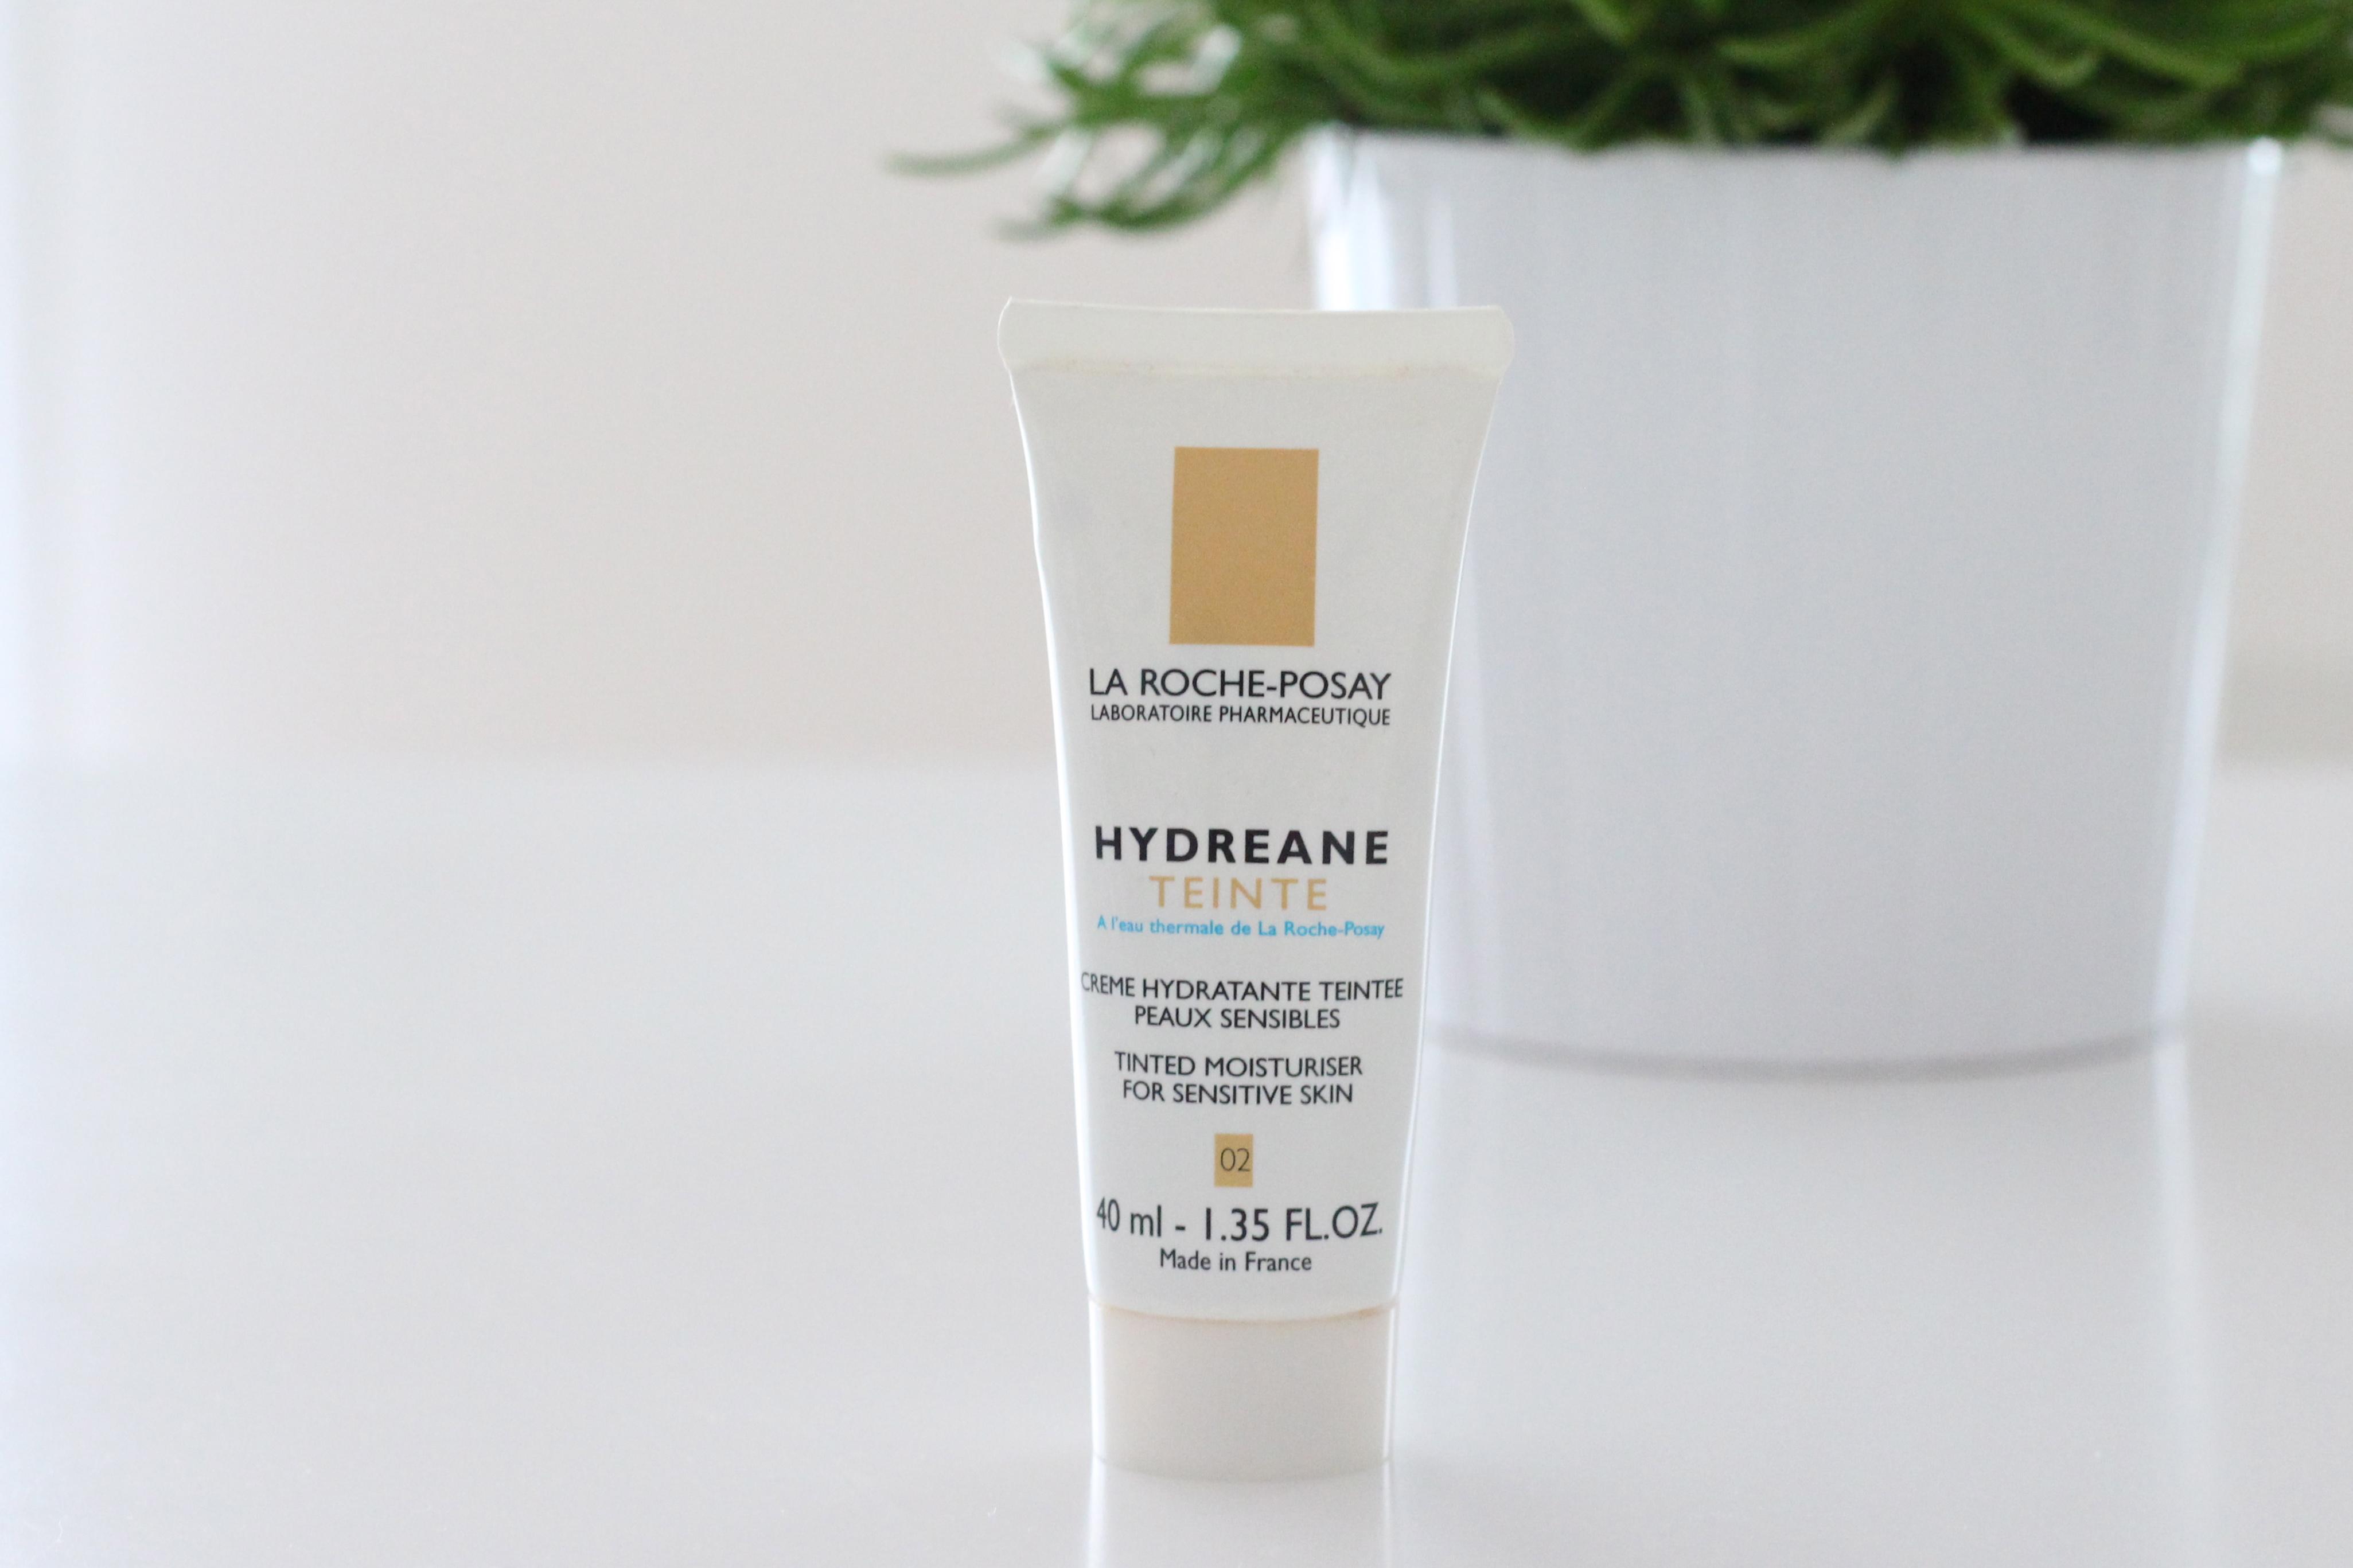 bb creme peau grasse pharmacie